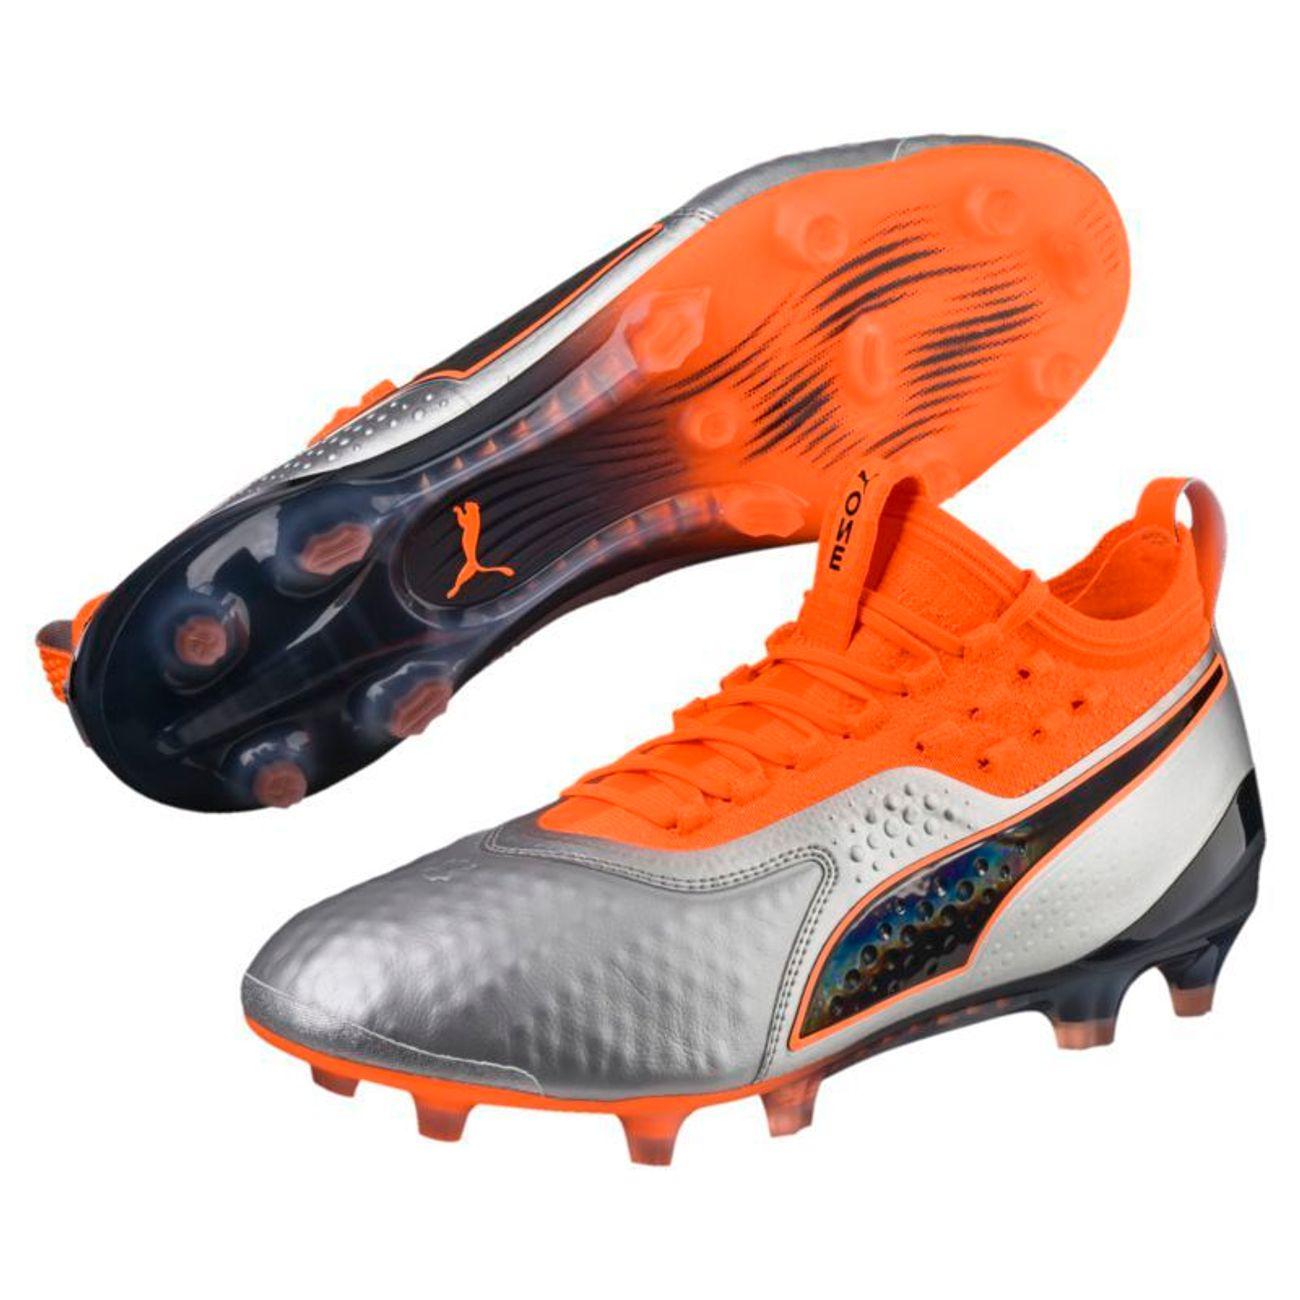 Homme Chaussures Fg Football Puma 1 One hsQrCBdxt